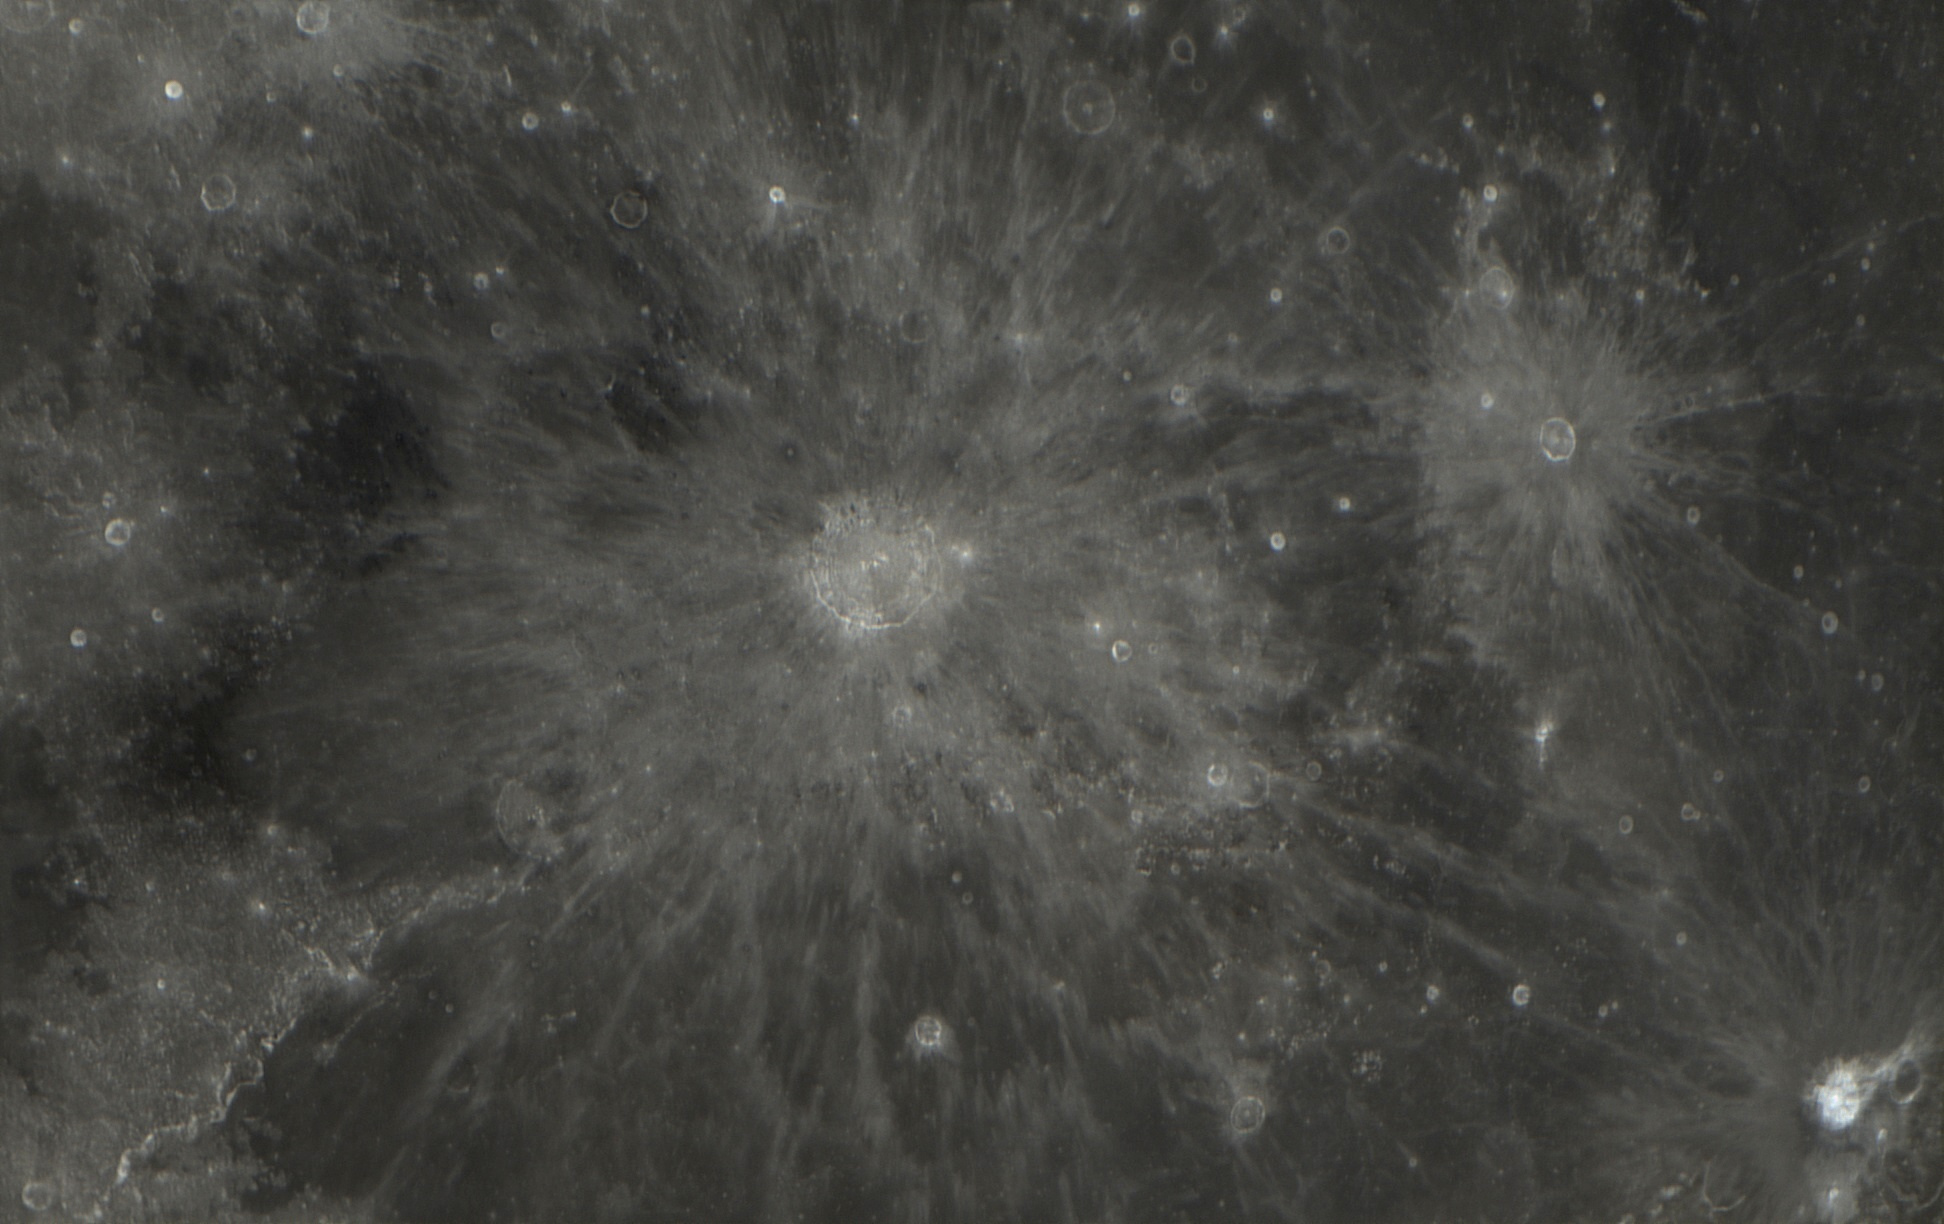 2019-09-16_T_00-52-15-0833_Copernic2.jpg.71ae7c2d214f3b94a57ace5f45d77259.jpg